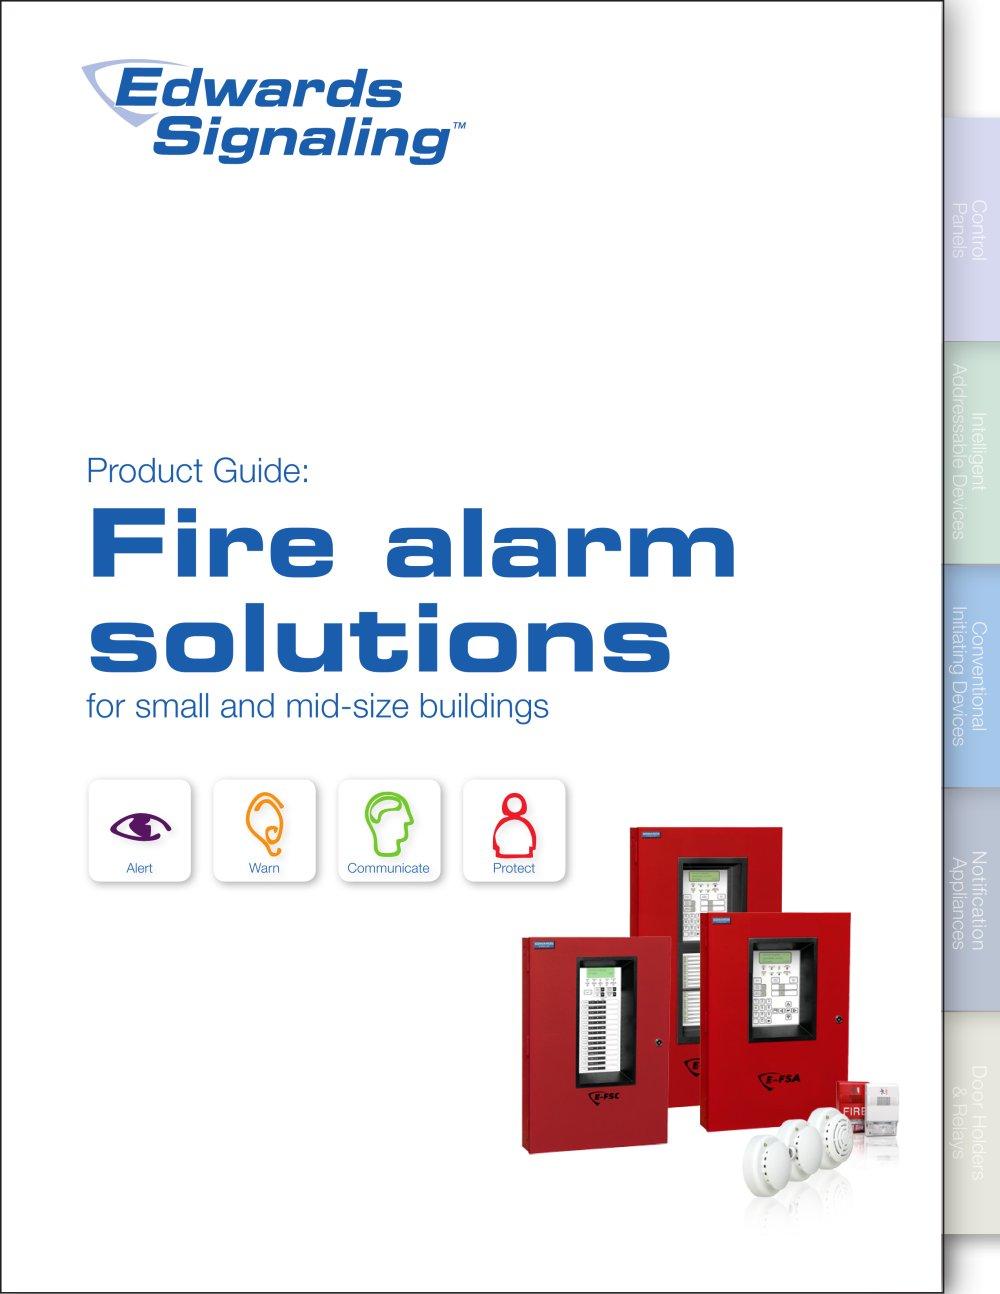 fire alarm product guide 252073_1b?resize\\\=840%2C1087 siemens fdbz492 hr wiring diagram gandul 45 77 79 119 fdcio422 wiring diagram at bayanpartner.co